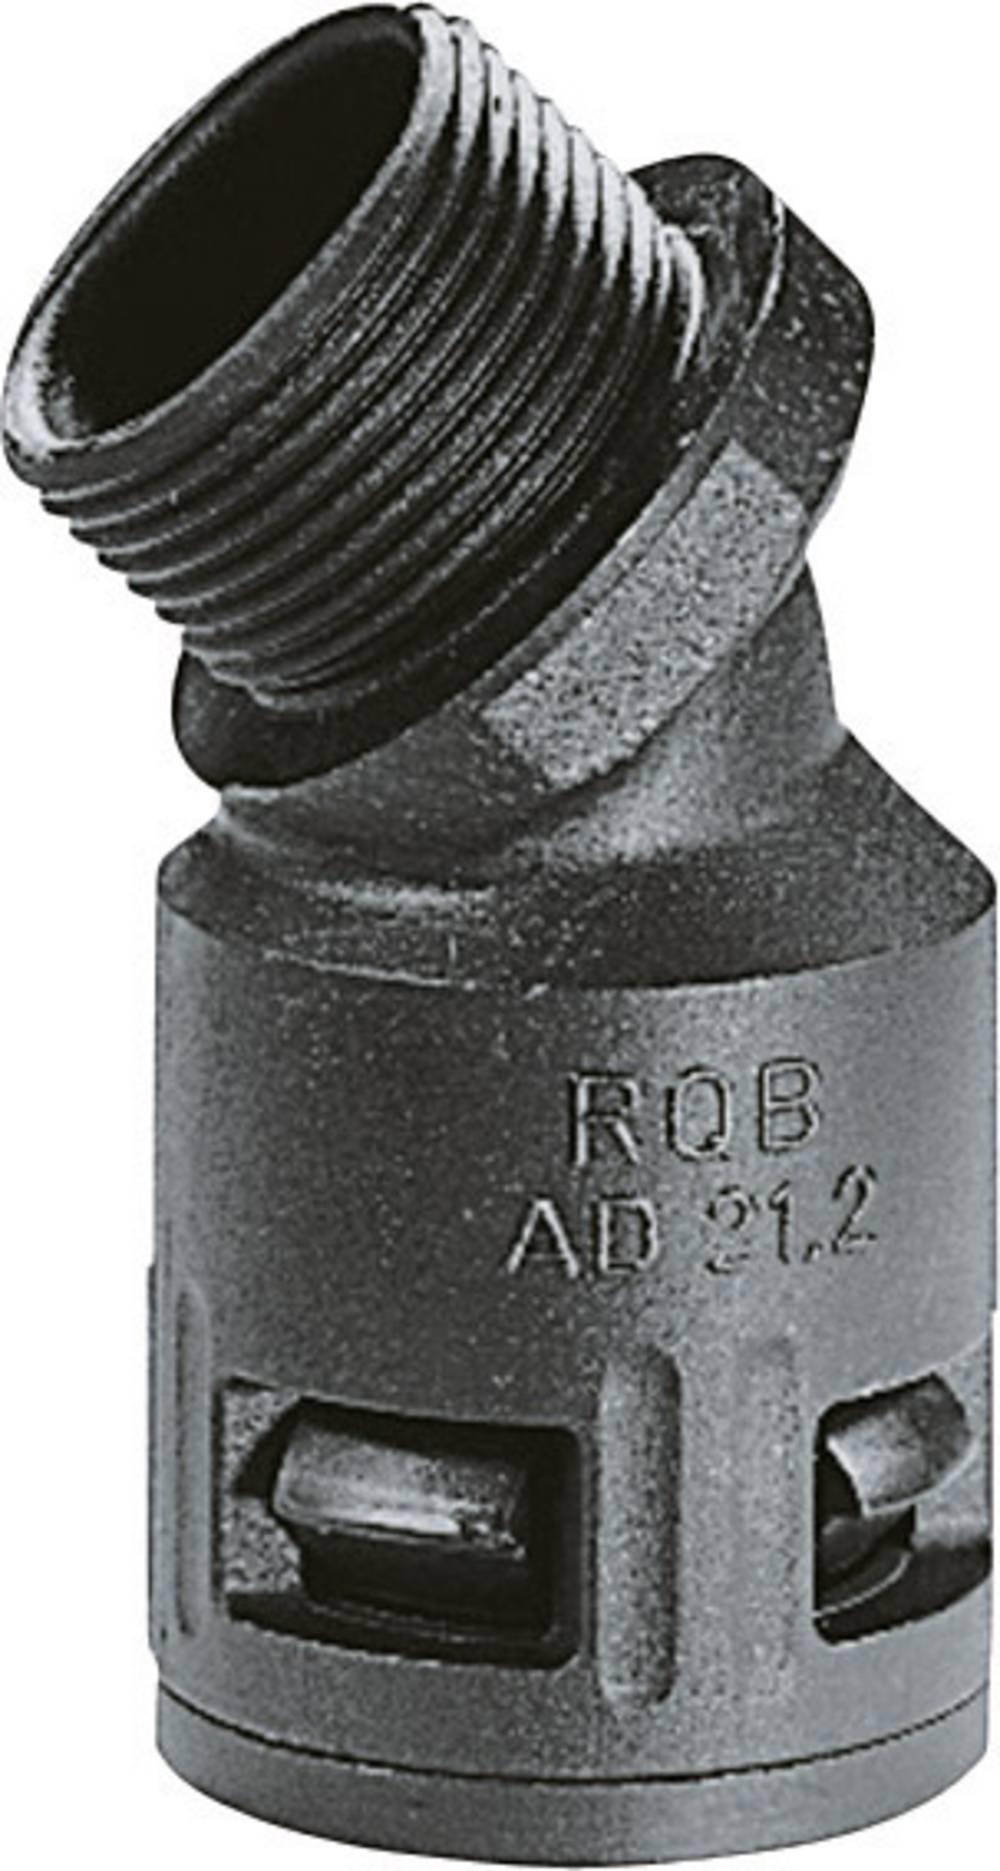 SILVYN® cevna uvodnica KLICK-45°B M IP66 SILVYN® KLICK 45°B IP66 40x1,5 BK LappKabel vsebuje: 1 kos